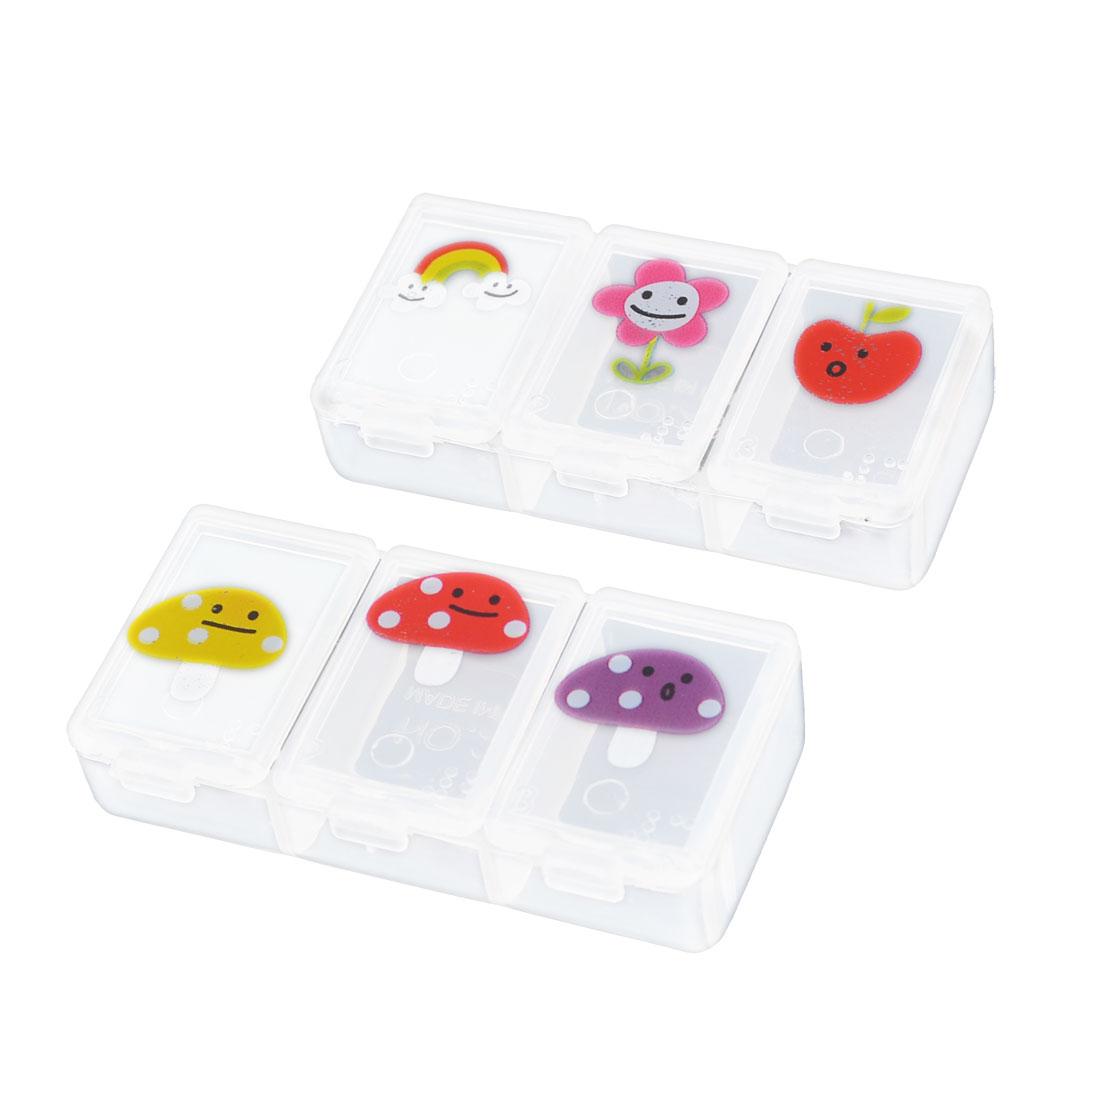 2 Pcs Clear Rectangle Plastic 3 Compartments Mini Medicine Pills Storage Case Box